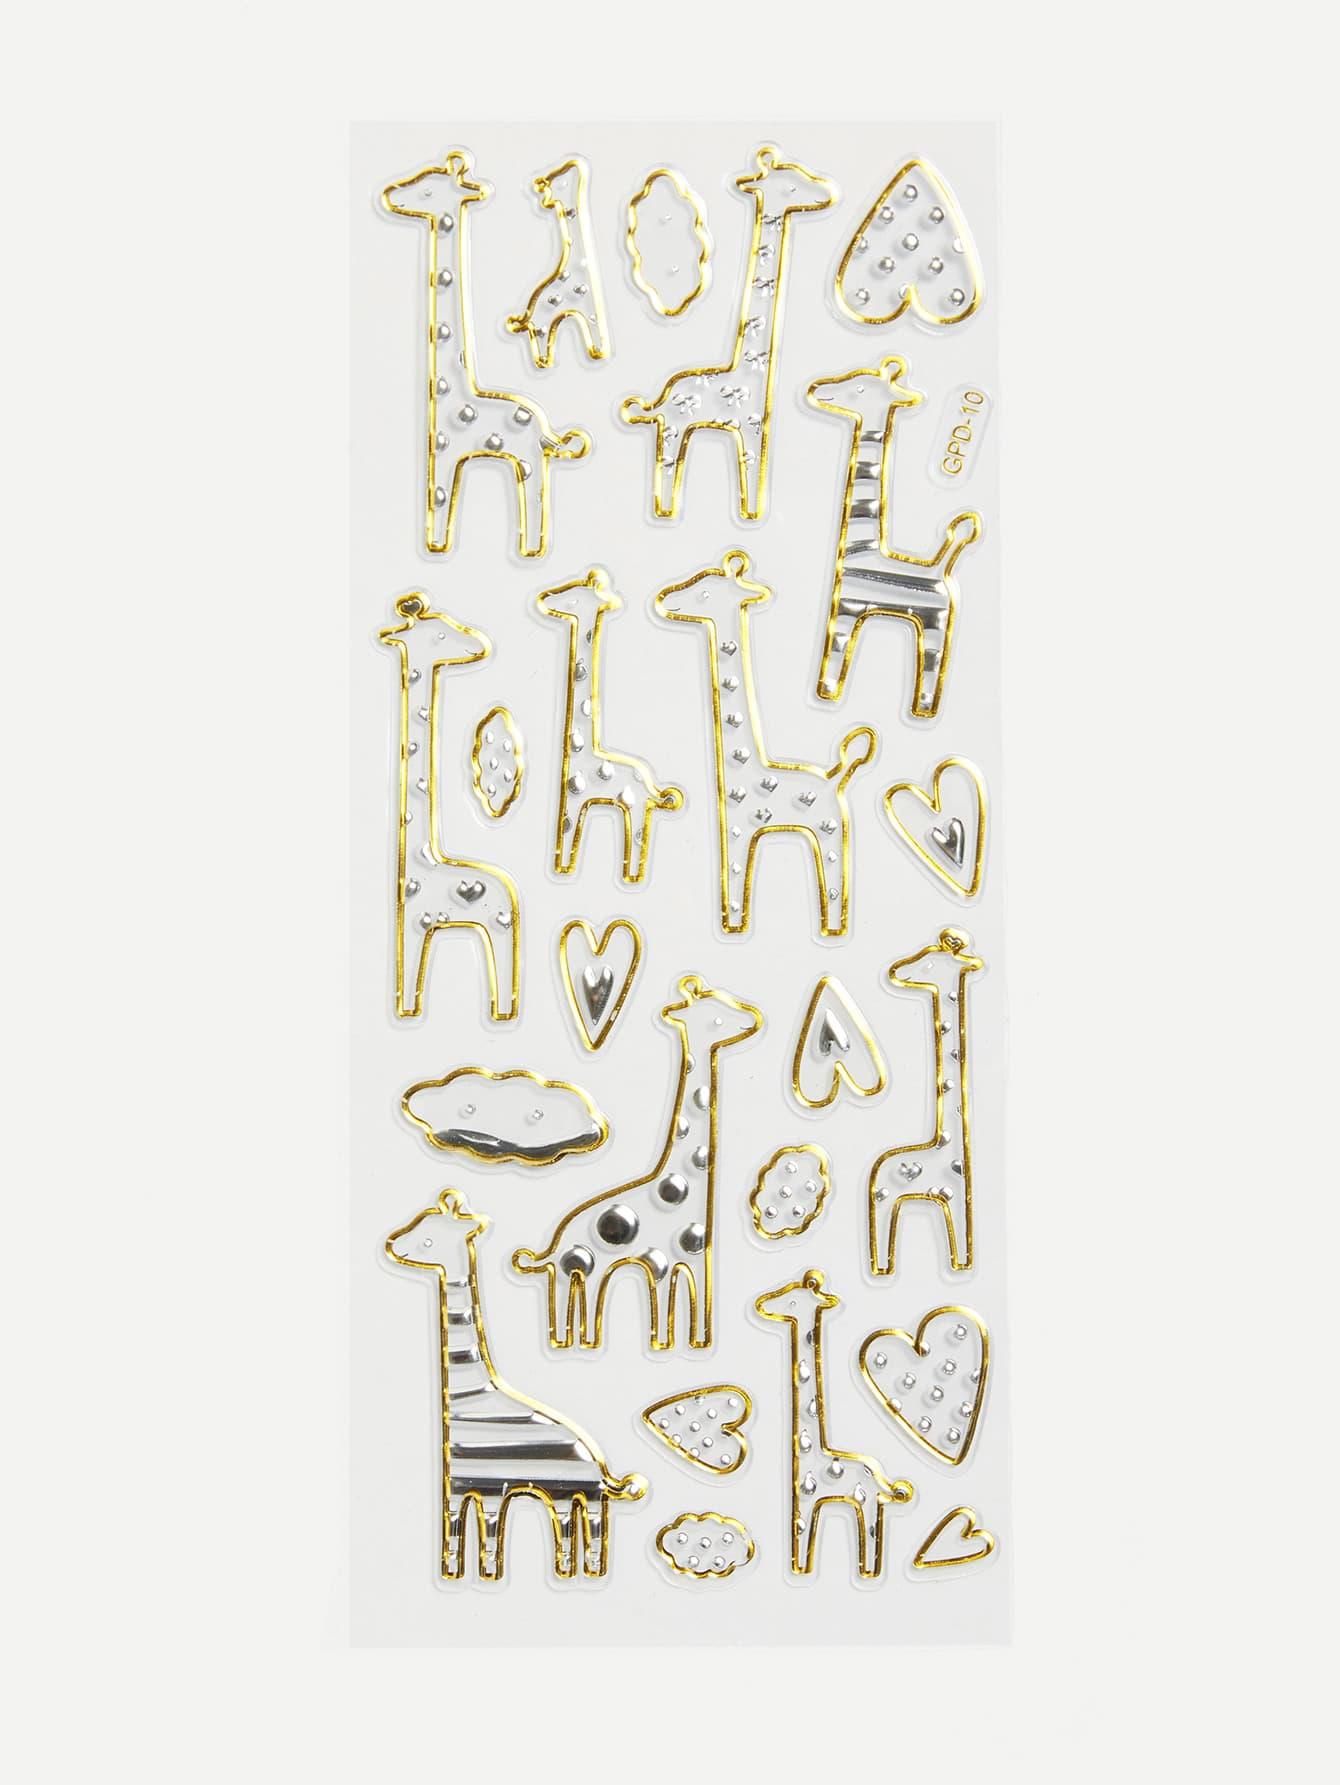 Cartoon Giraffe Wall Stickers giraffe animal removable wall stickers for kids